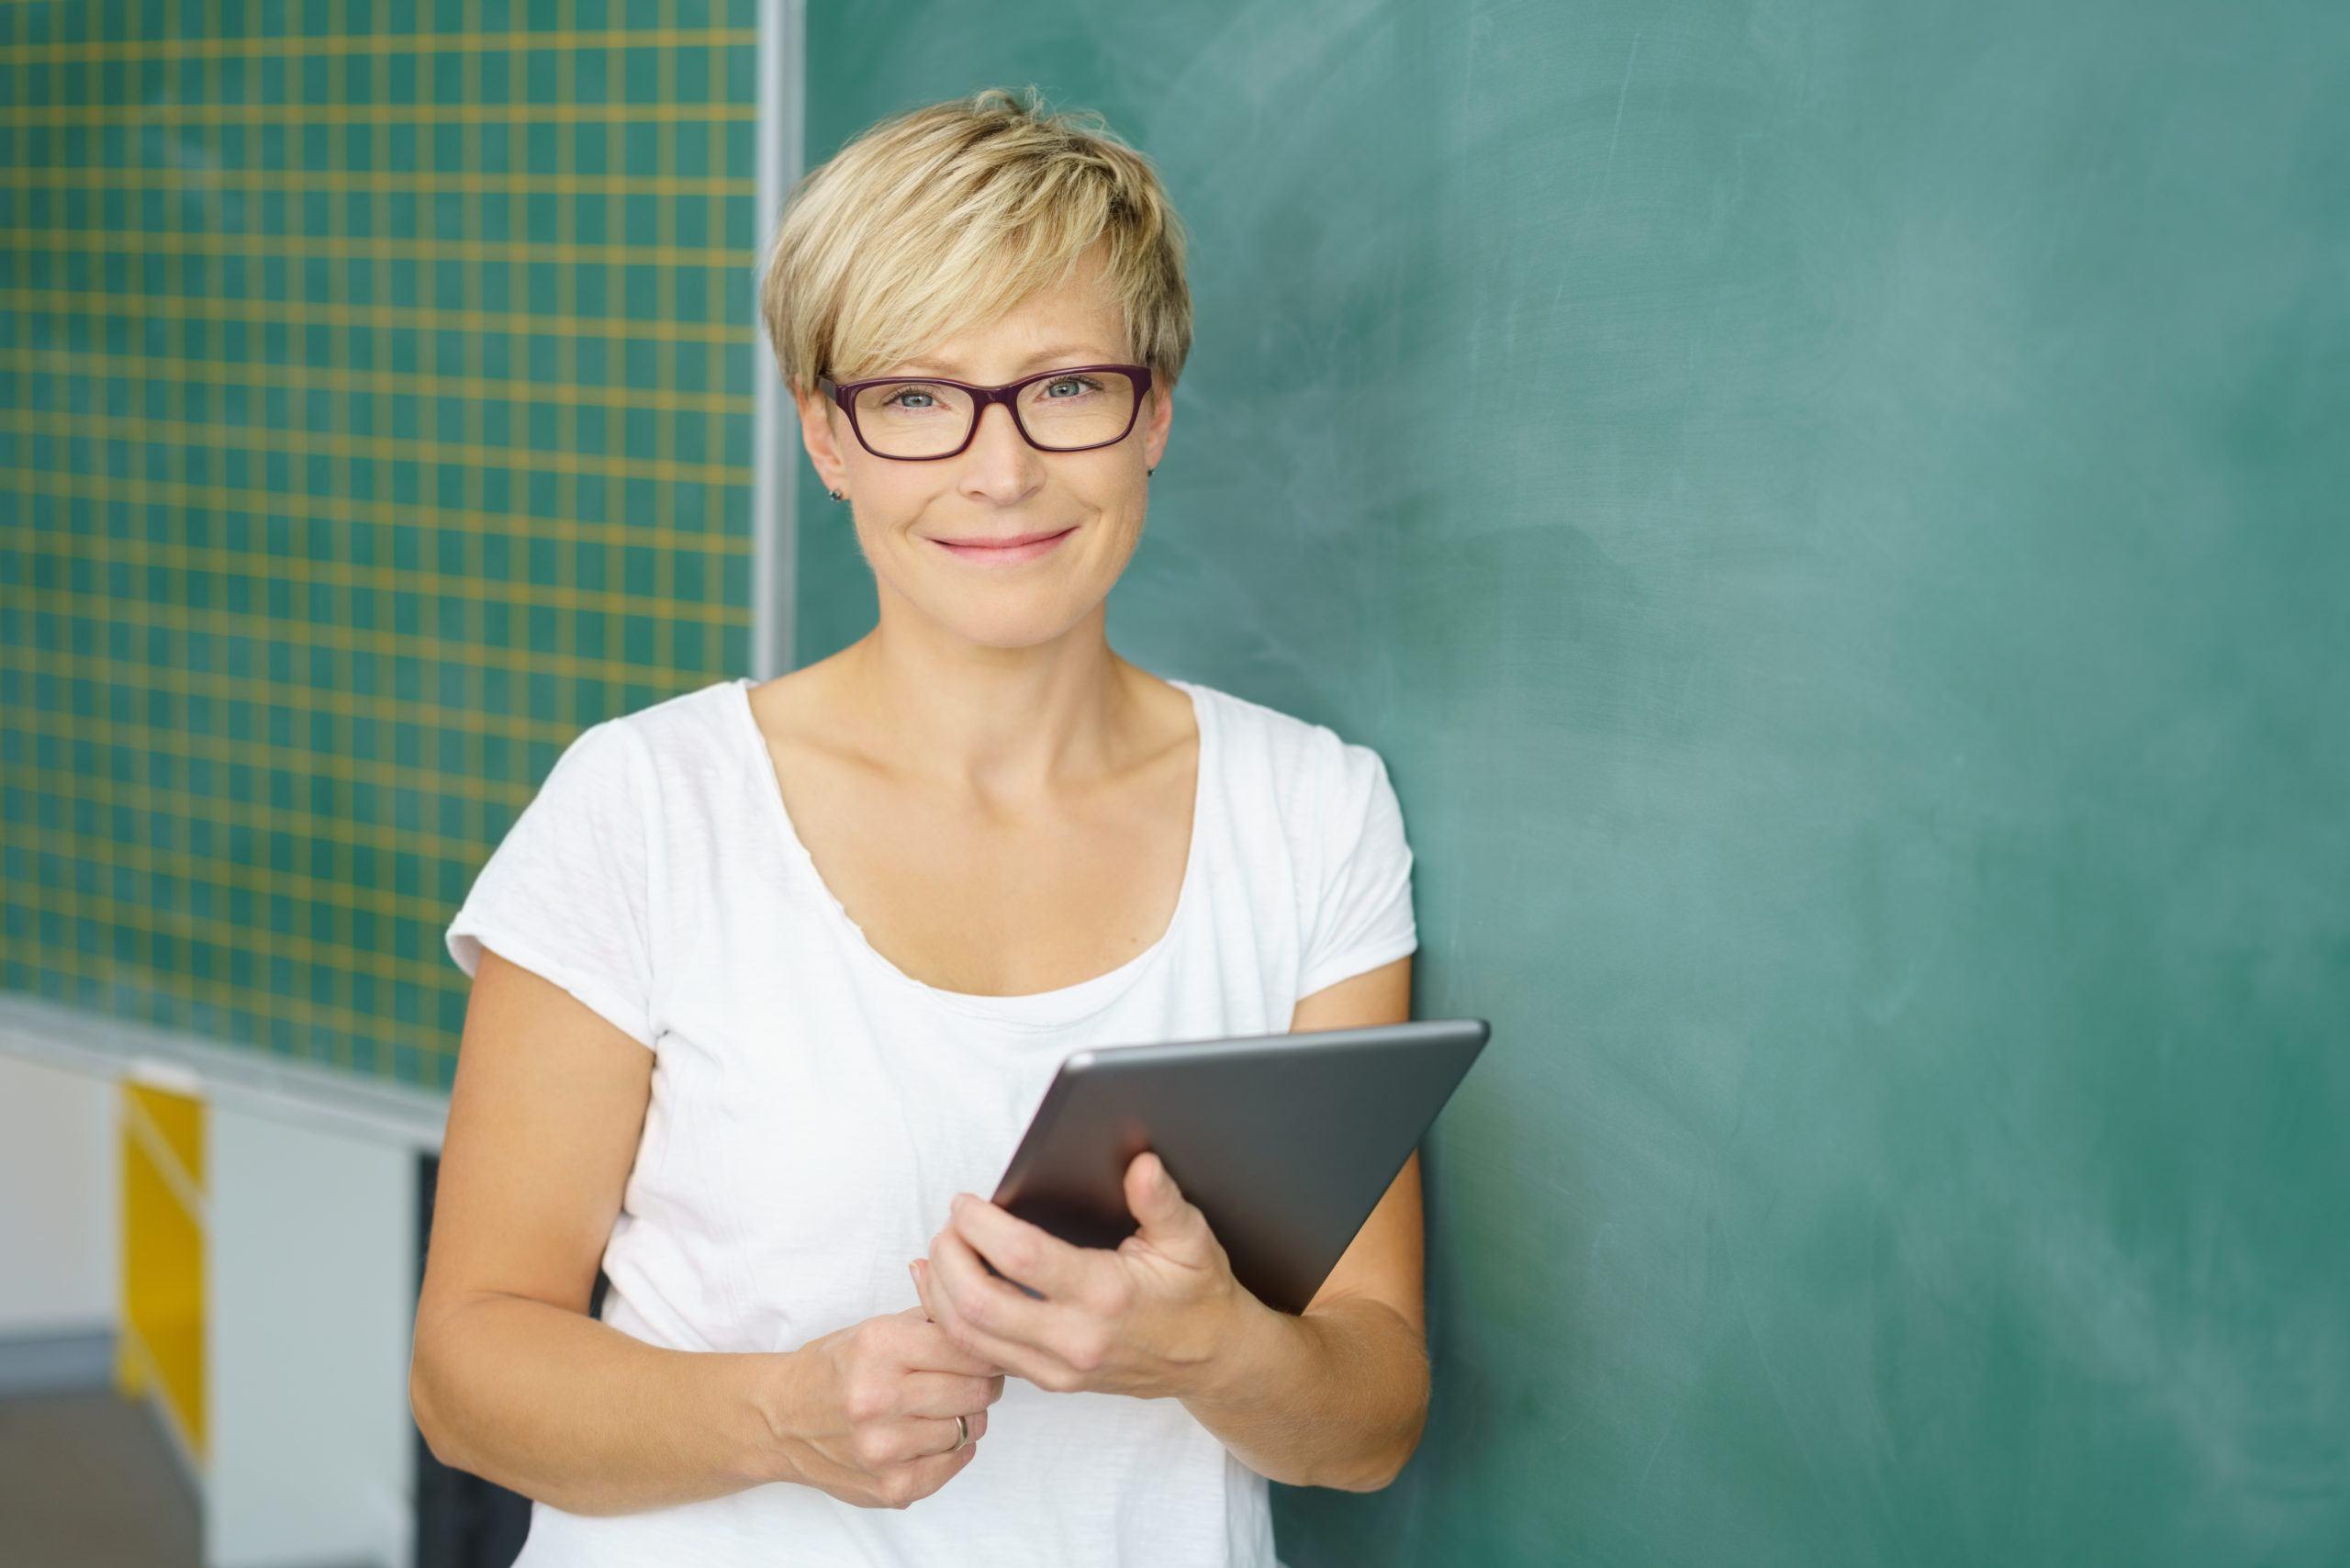 Weltlehrertag